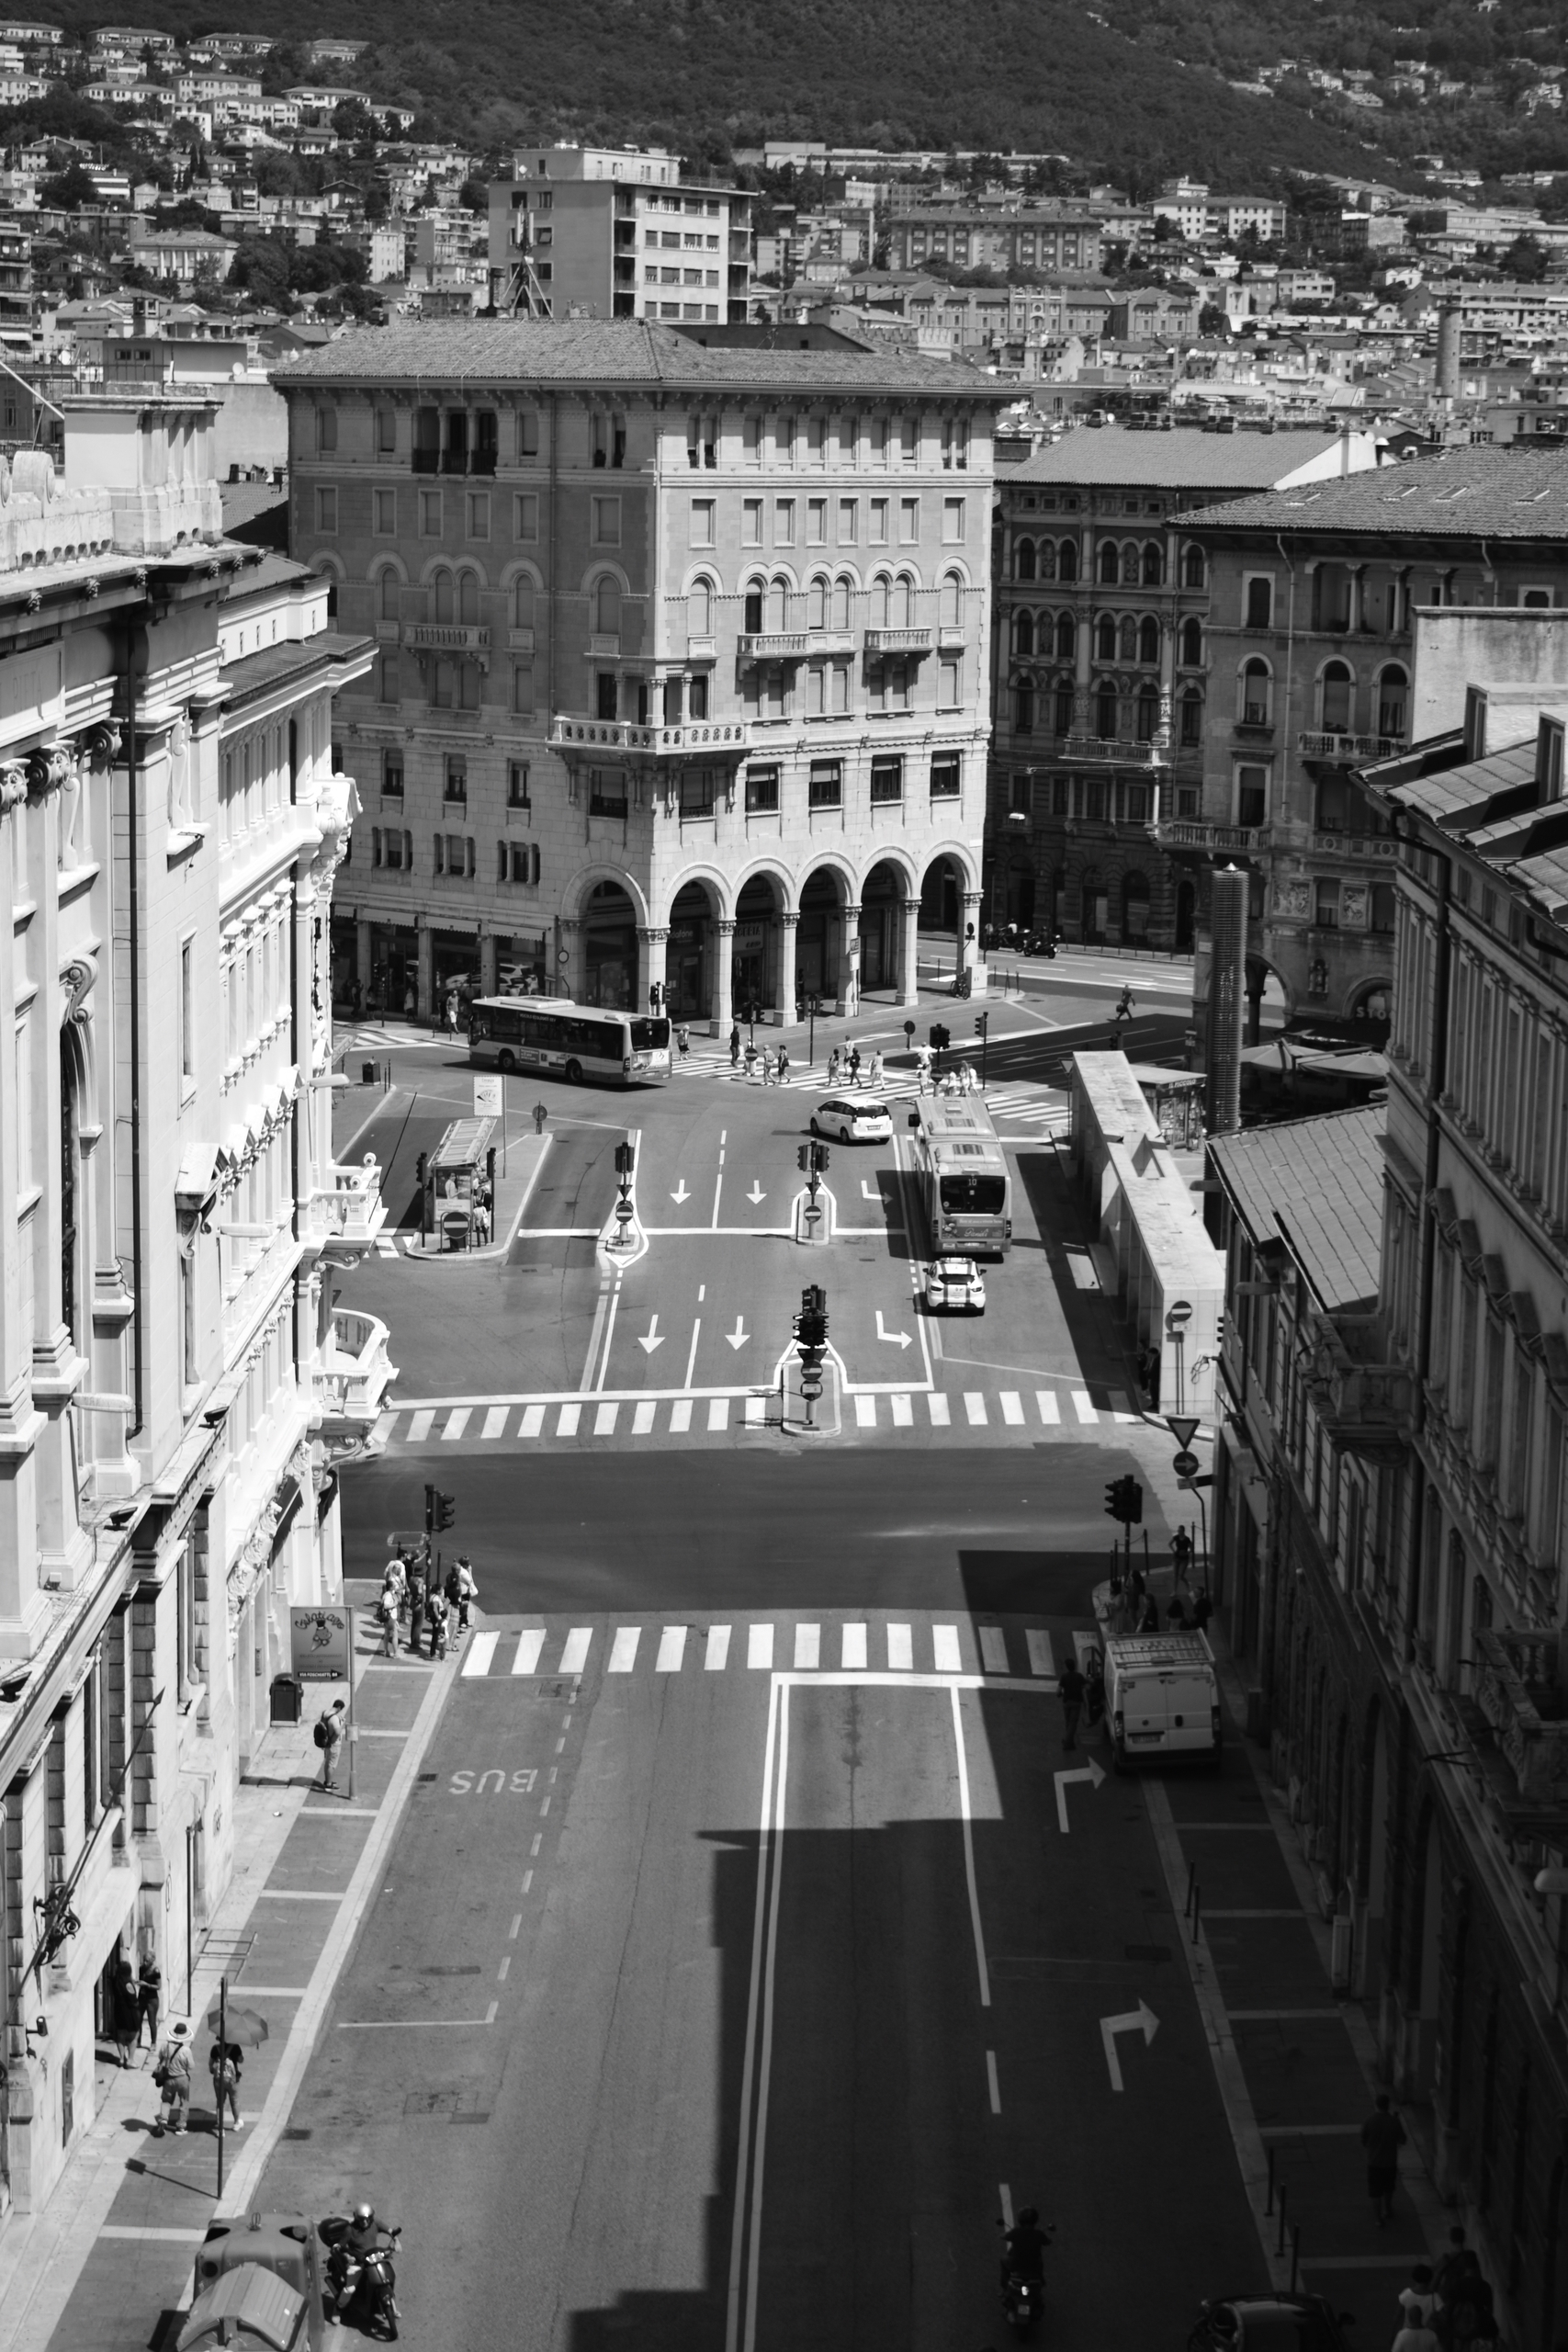 Triest, Italy, 2017 - ivanlich | ello